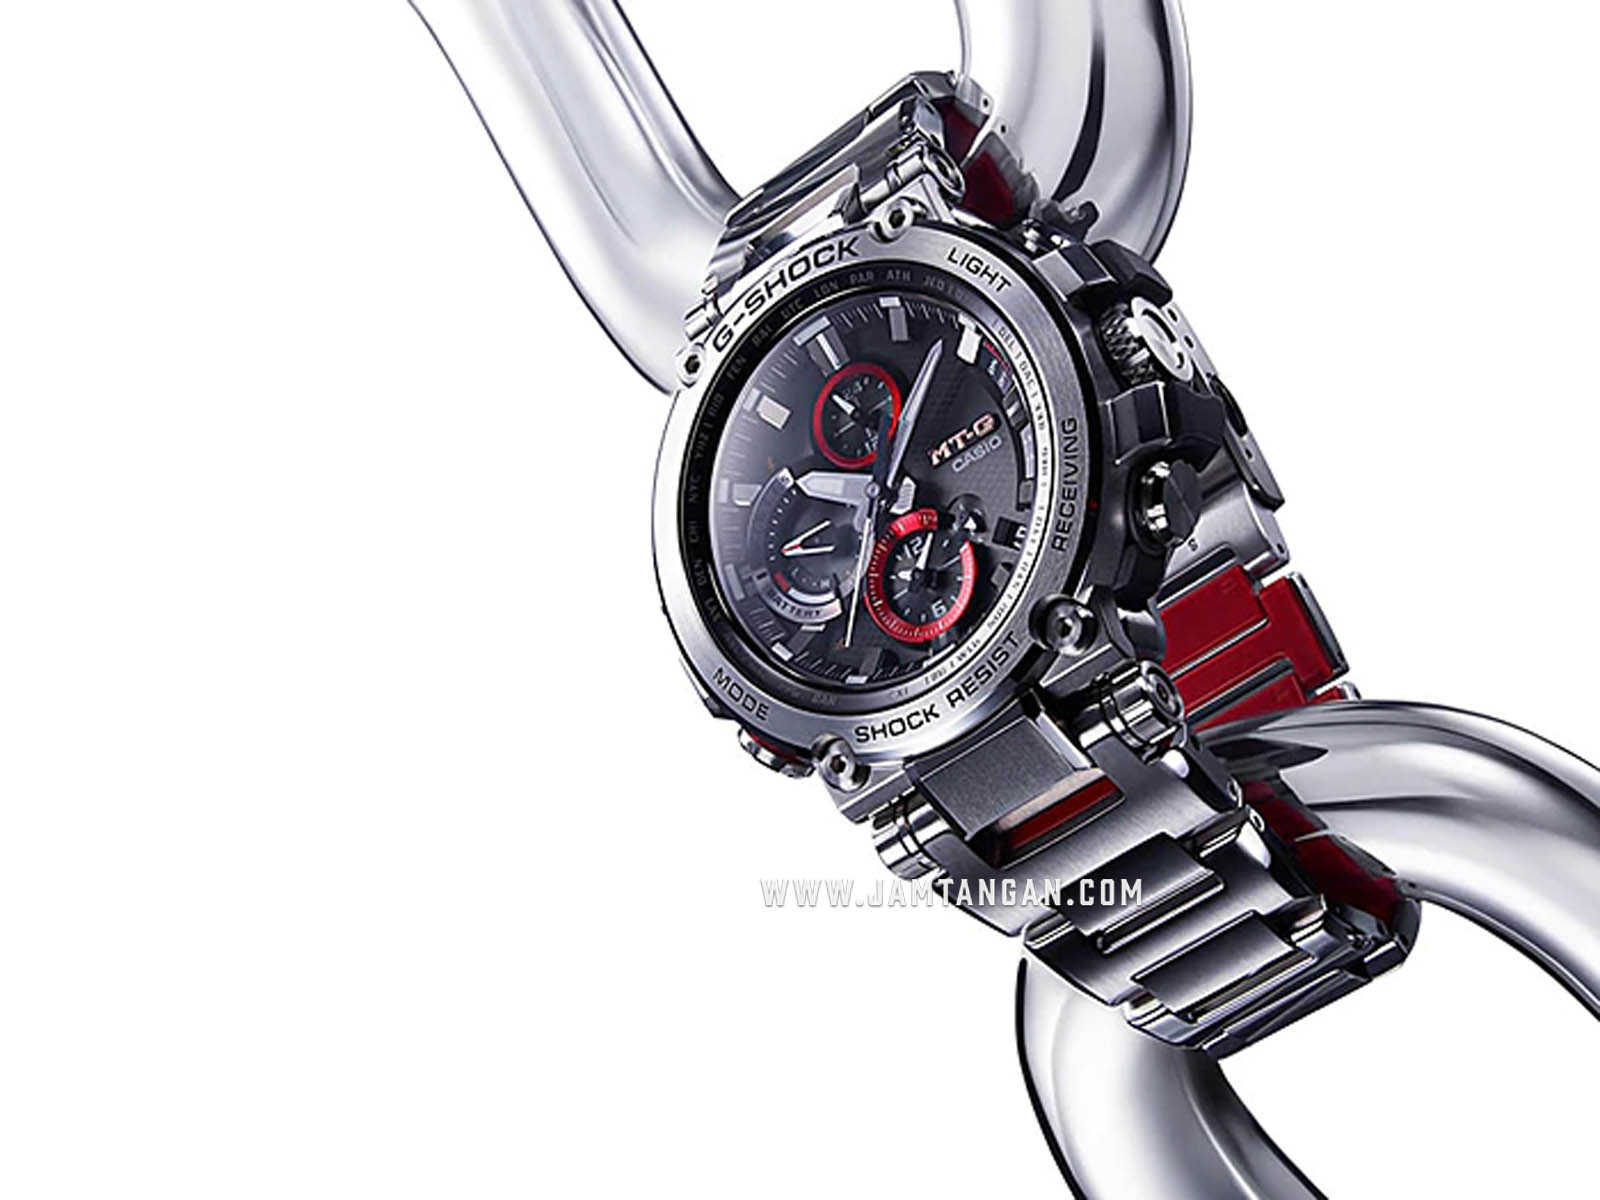 Casio G-Shock MTG-B1000D-1AJF MT-G Chronograph Black Dial Silver Composite Strap Machtwatch